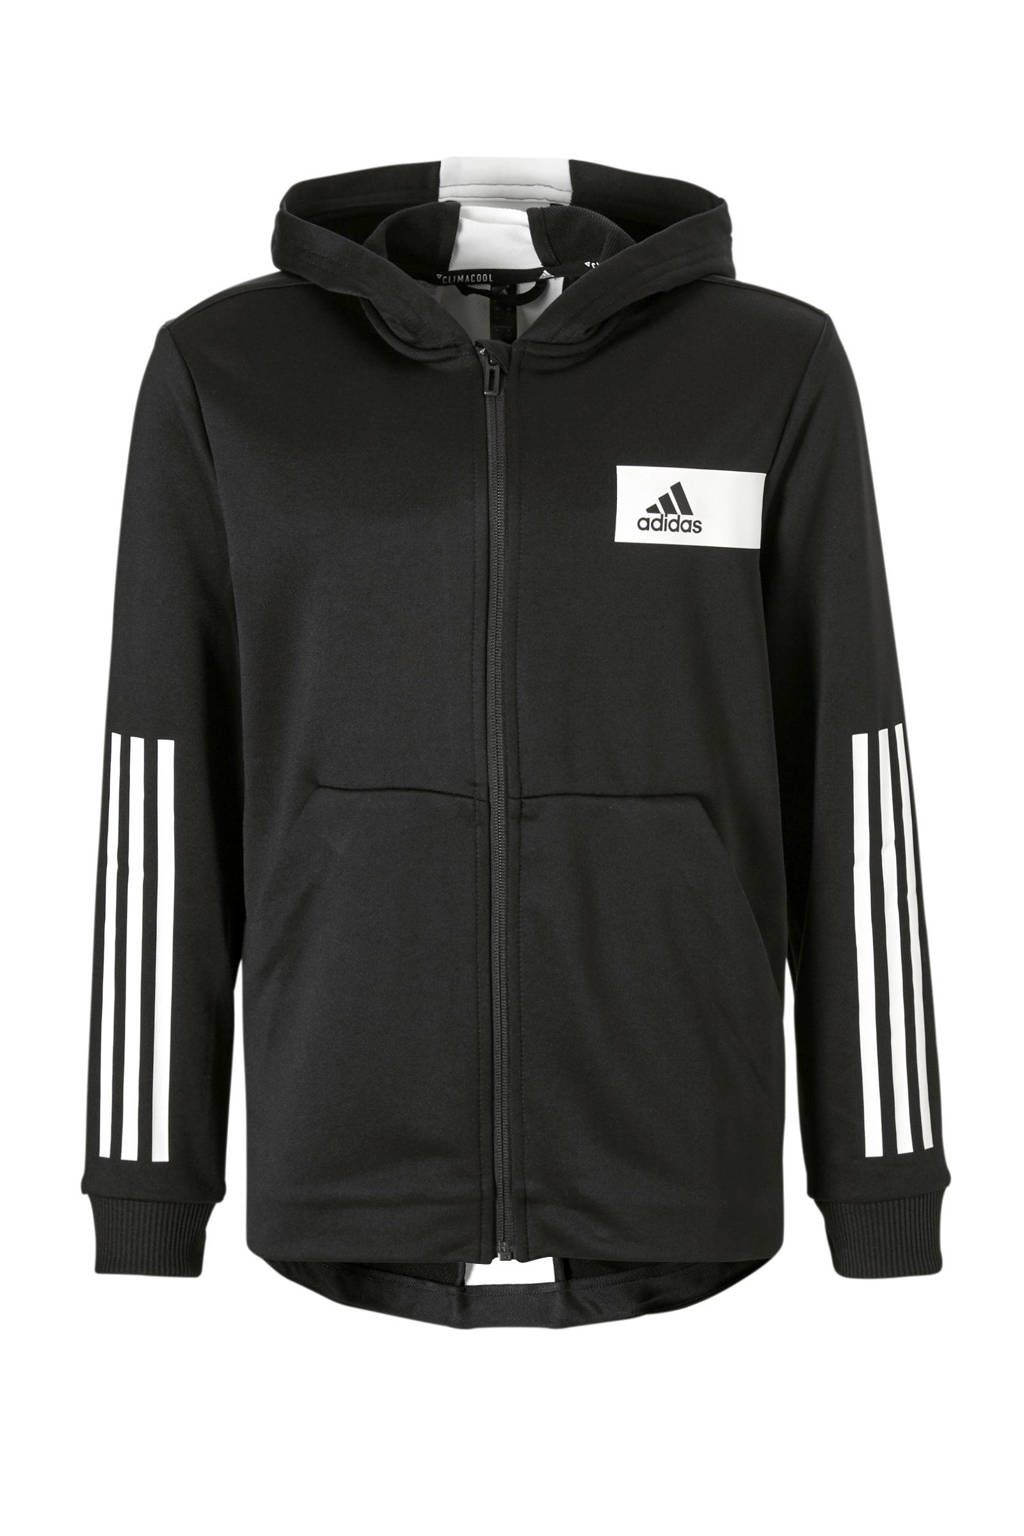 adidas performance   Freelift sportvest zwart, Zwart/wit